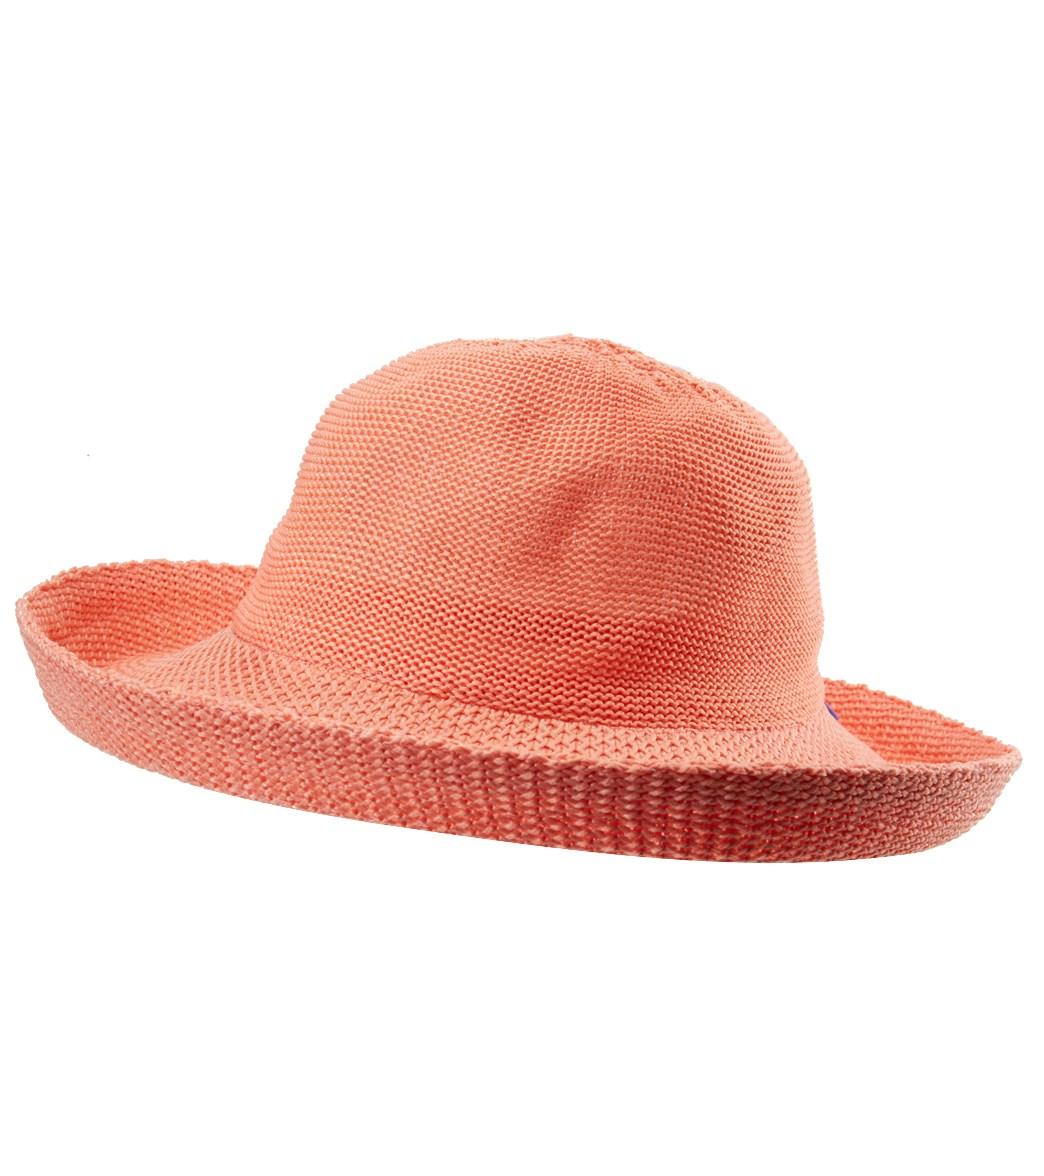 e98ee49900c Wallaroo Women s Petite Victoria Sun Hat at SwimOutlet.com